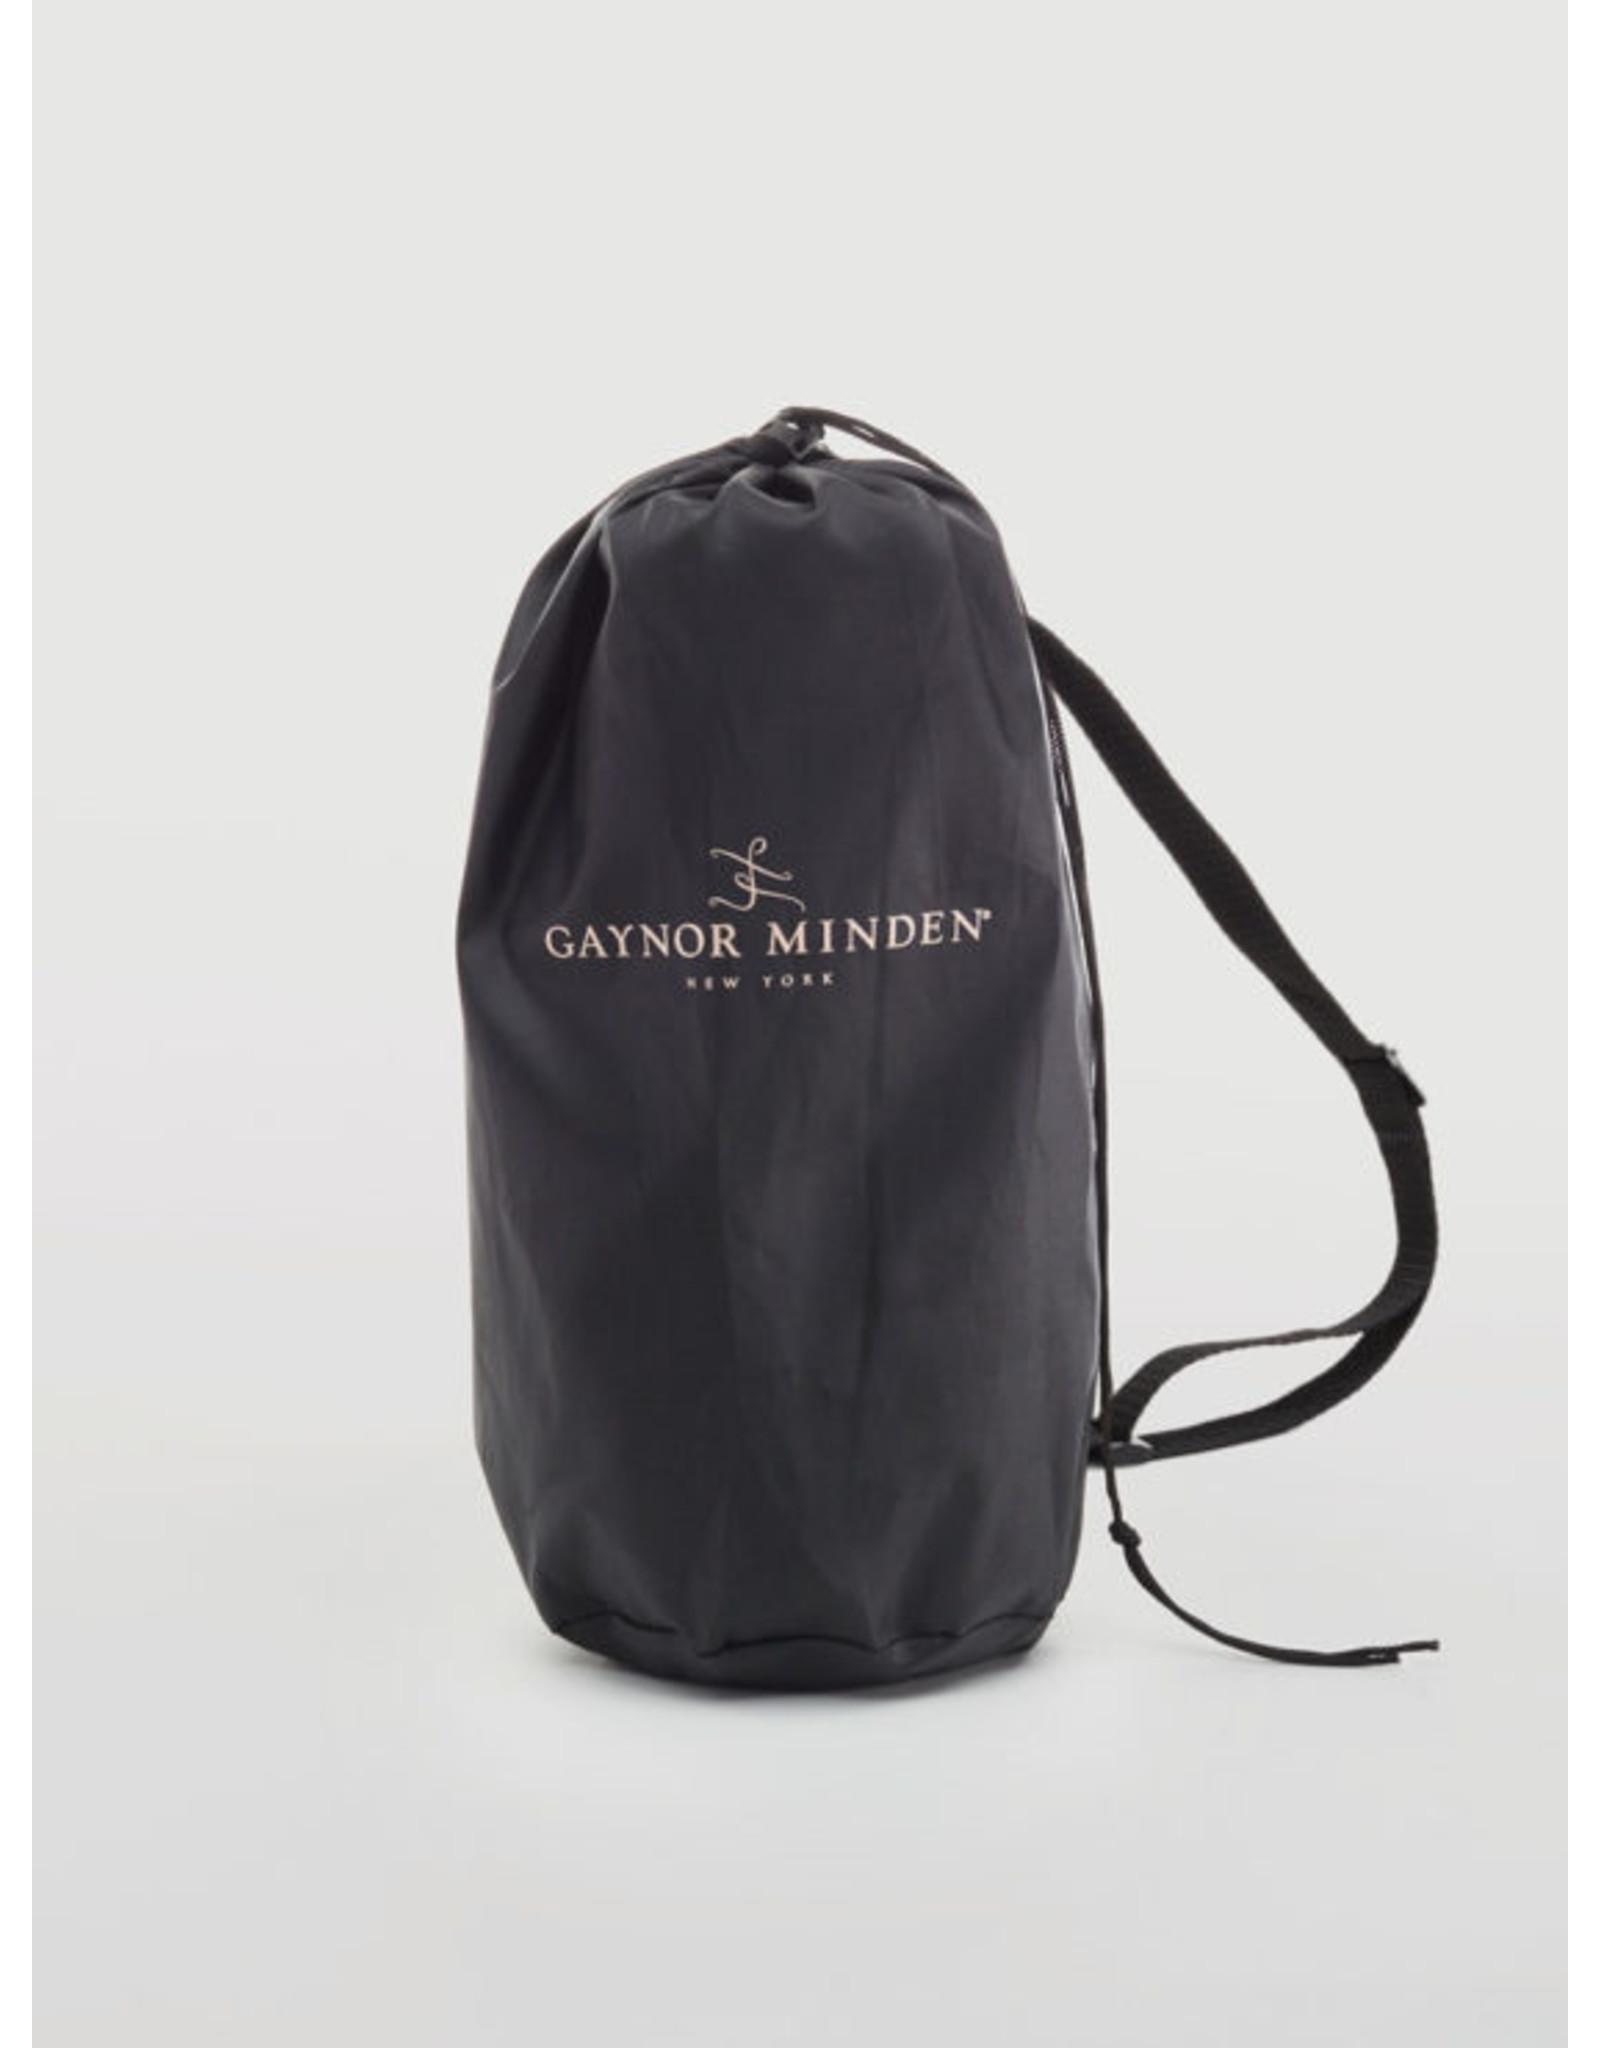 Gaynor Minden Gaynor Minden Roller Kit (TA-R-113)